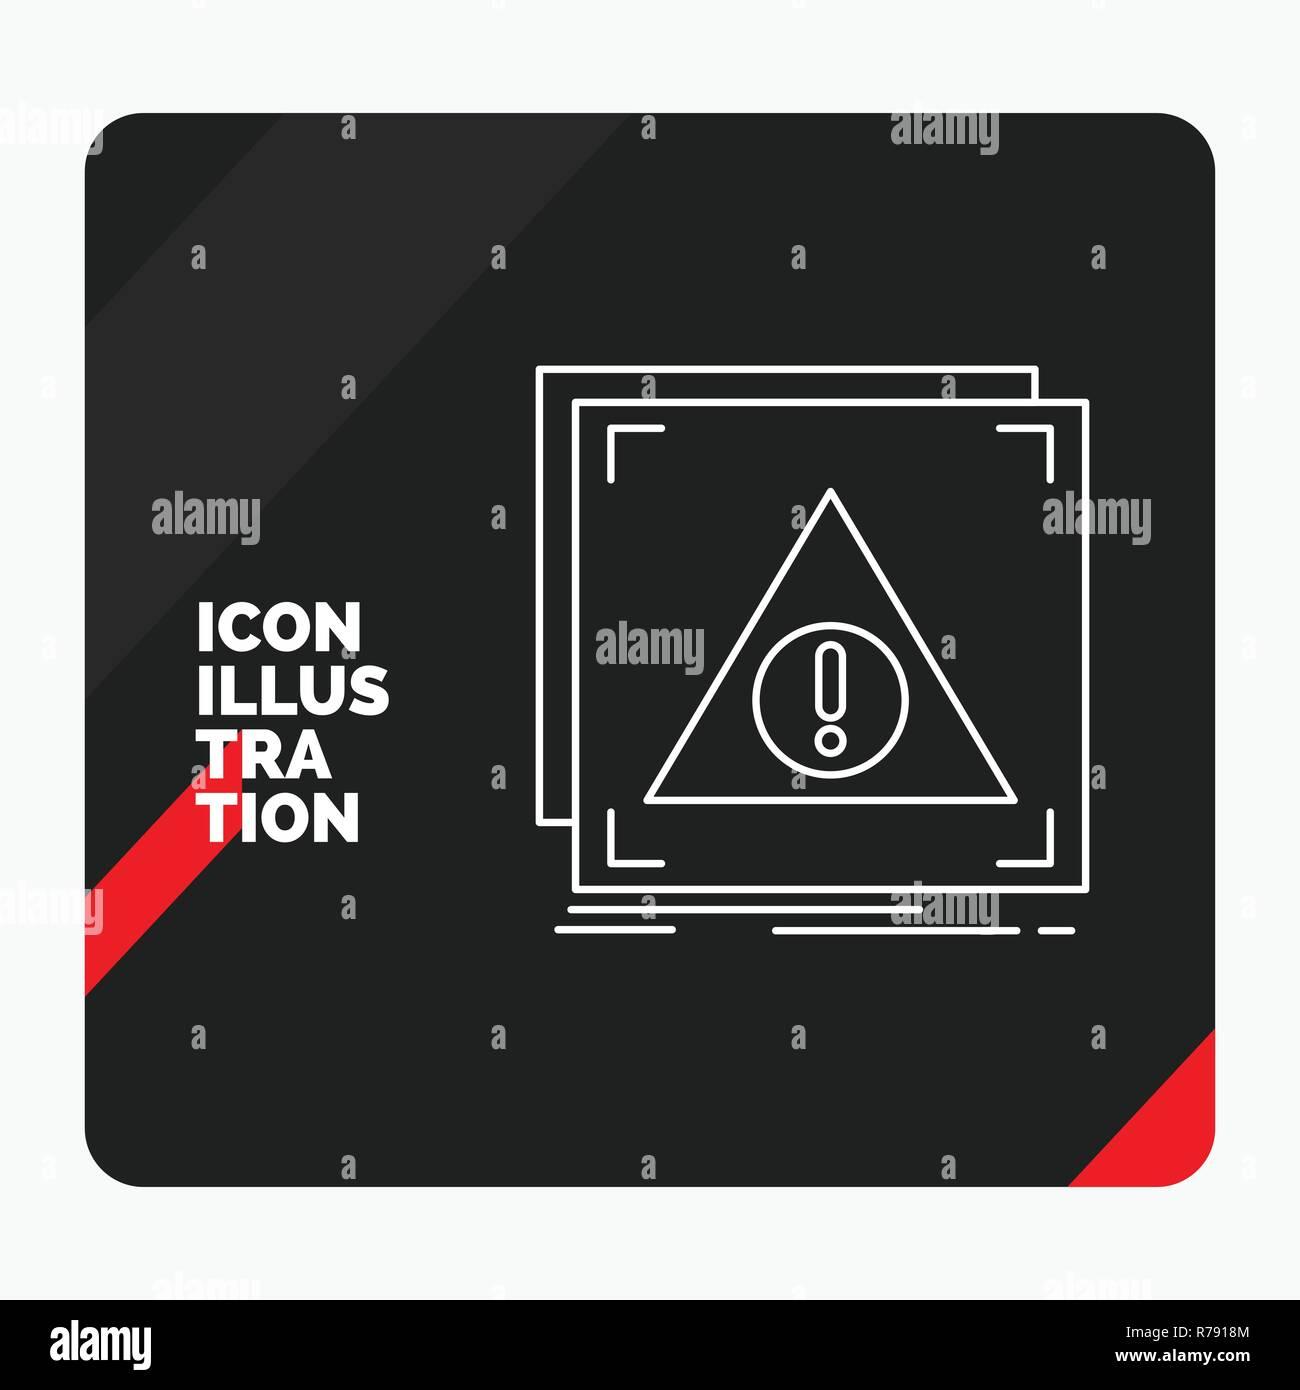 Red and Black Creative presentation Background for Error, Application, Denied, server, alert Line Icon - Stock Image